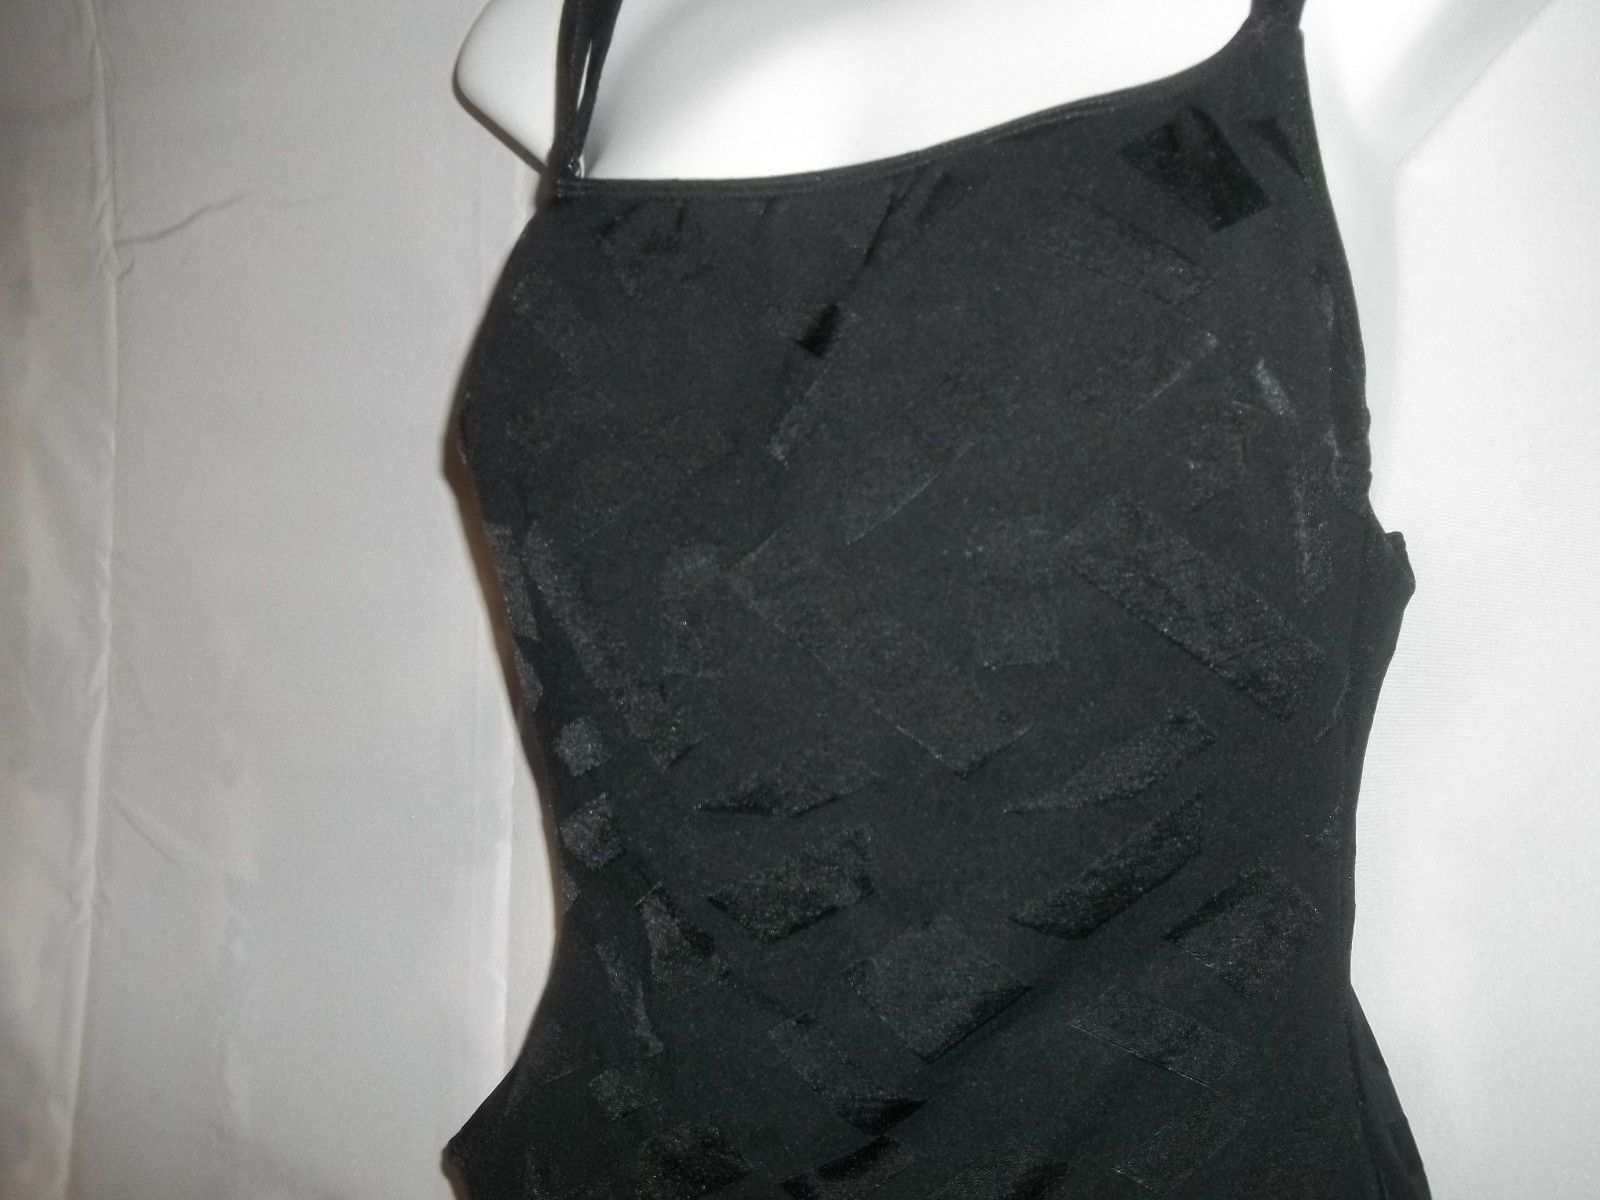 la blanca single mature ladies Free shipping and returns on women's la blanca pink swimwear & cover-ups at nordstromcom.